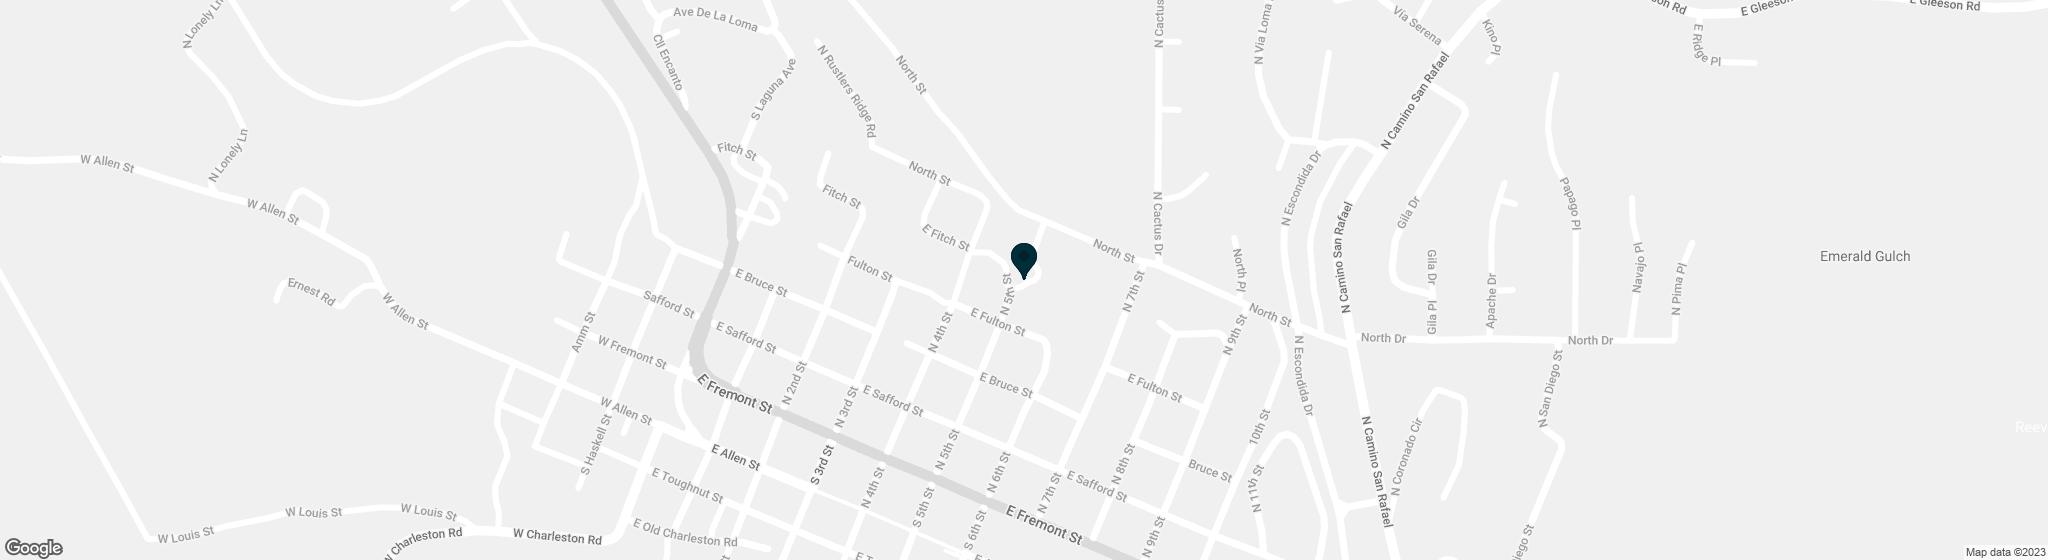 Lot 40 N Papago Place #40 Tombstone AZ 85638